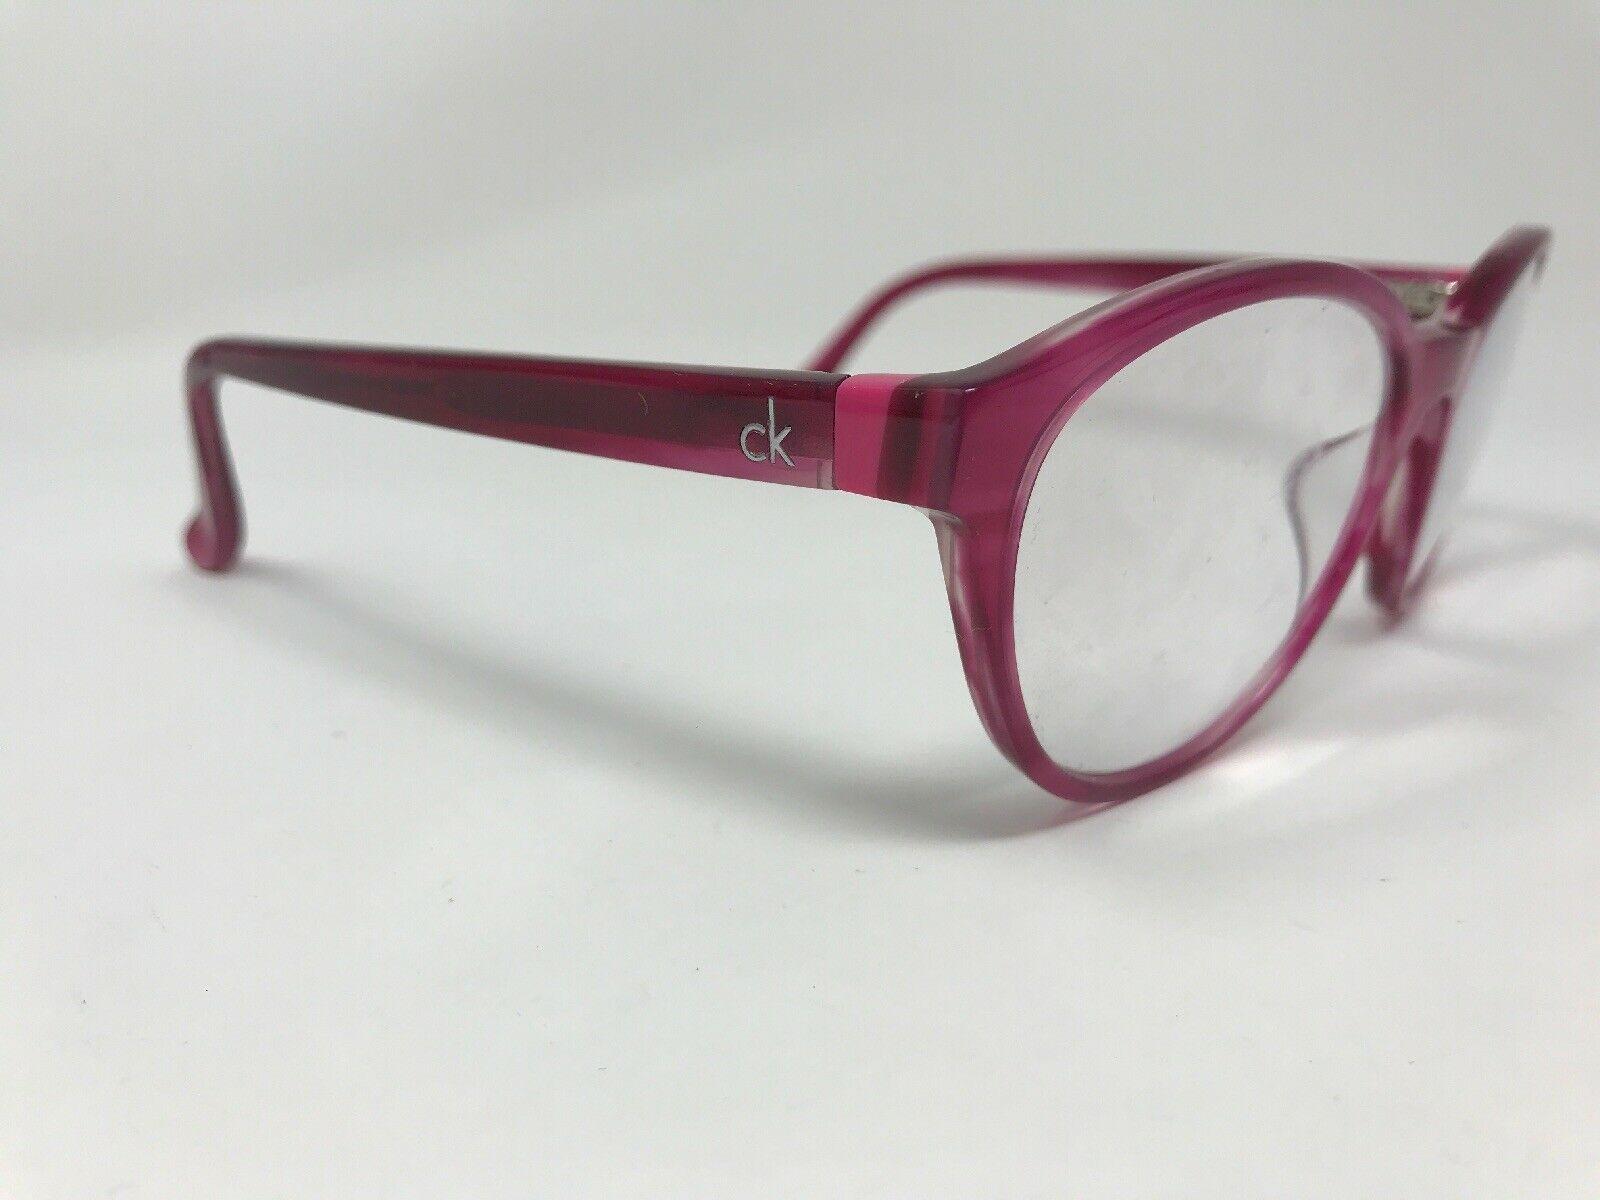 CALVIN KLEIN Eyeglasses Frame CK5881 611 Womens 51-18-135 Pink Crystal GB30